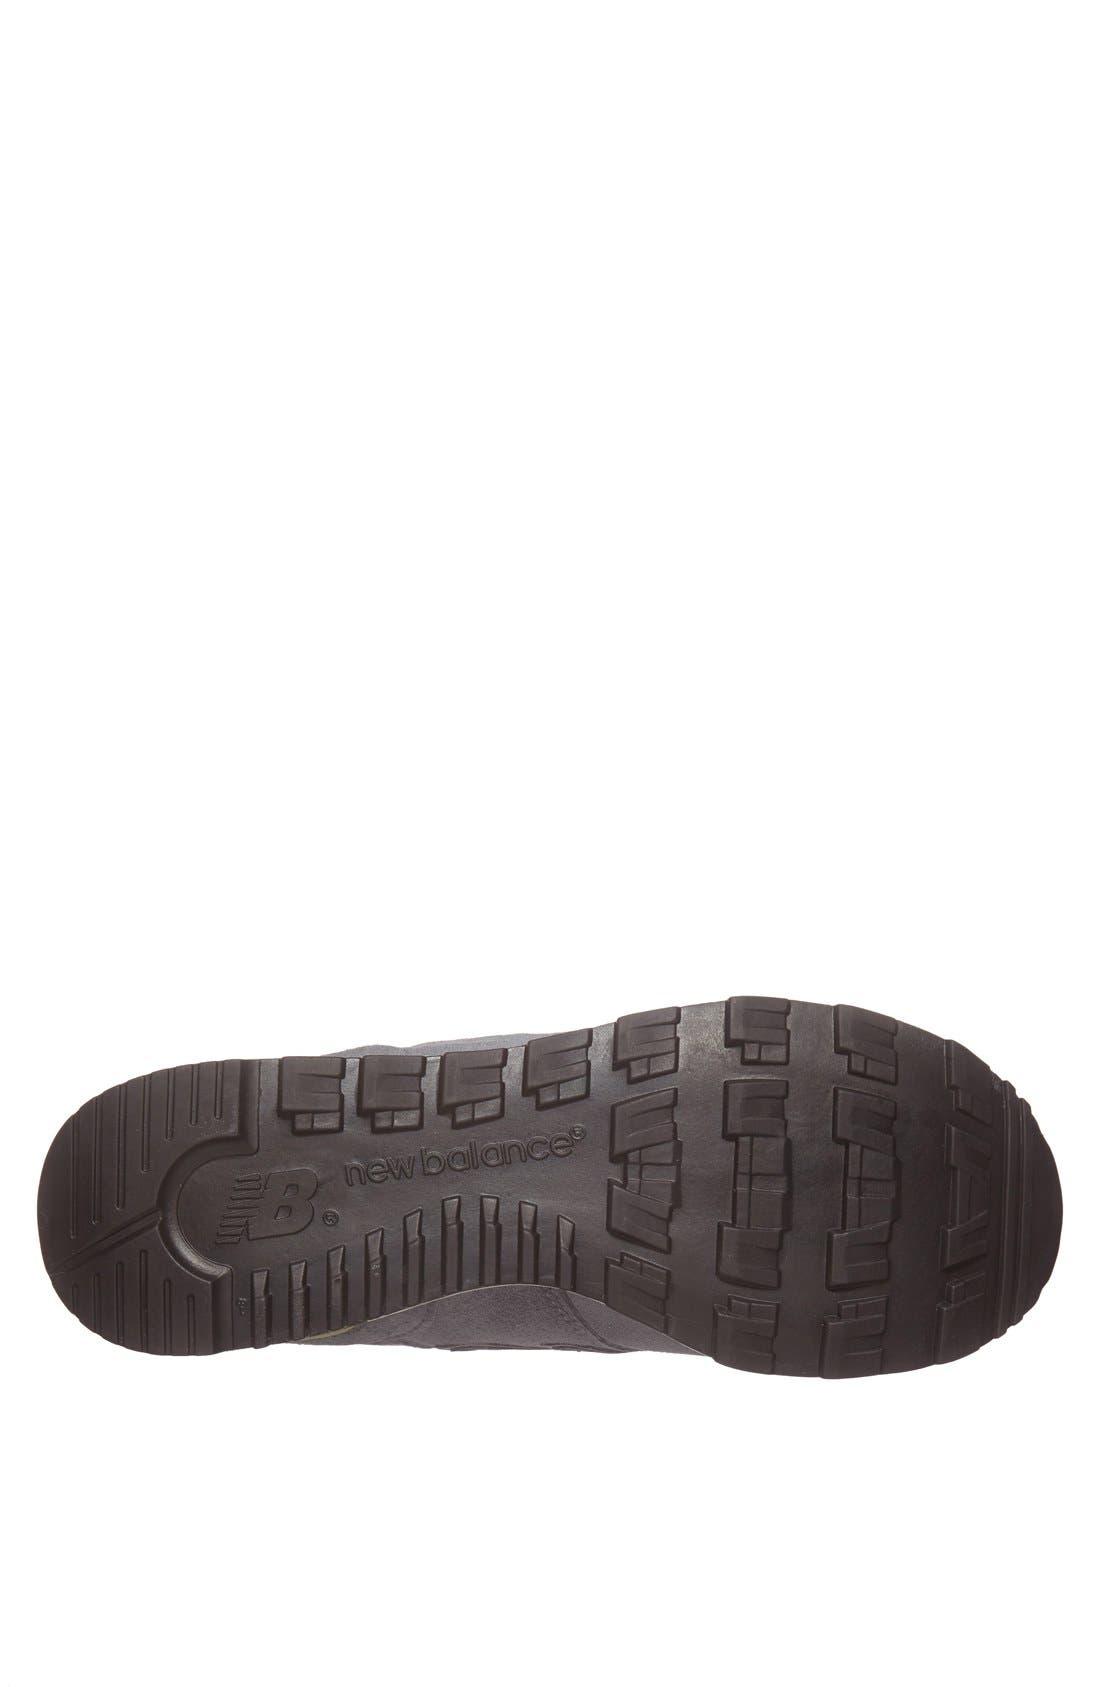 Alternate Image 4  - New Balance '1400' Suede Running Shoe (Men)